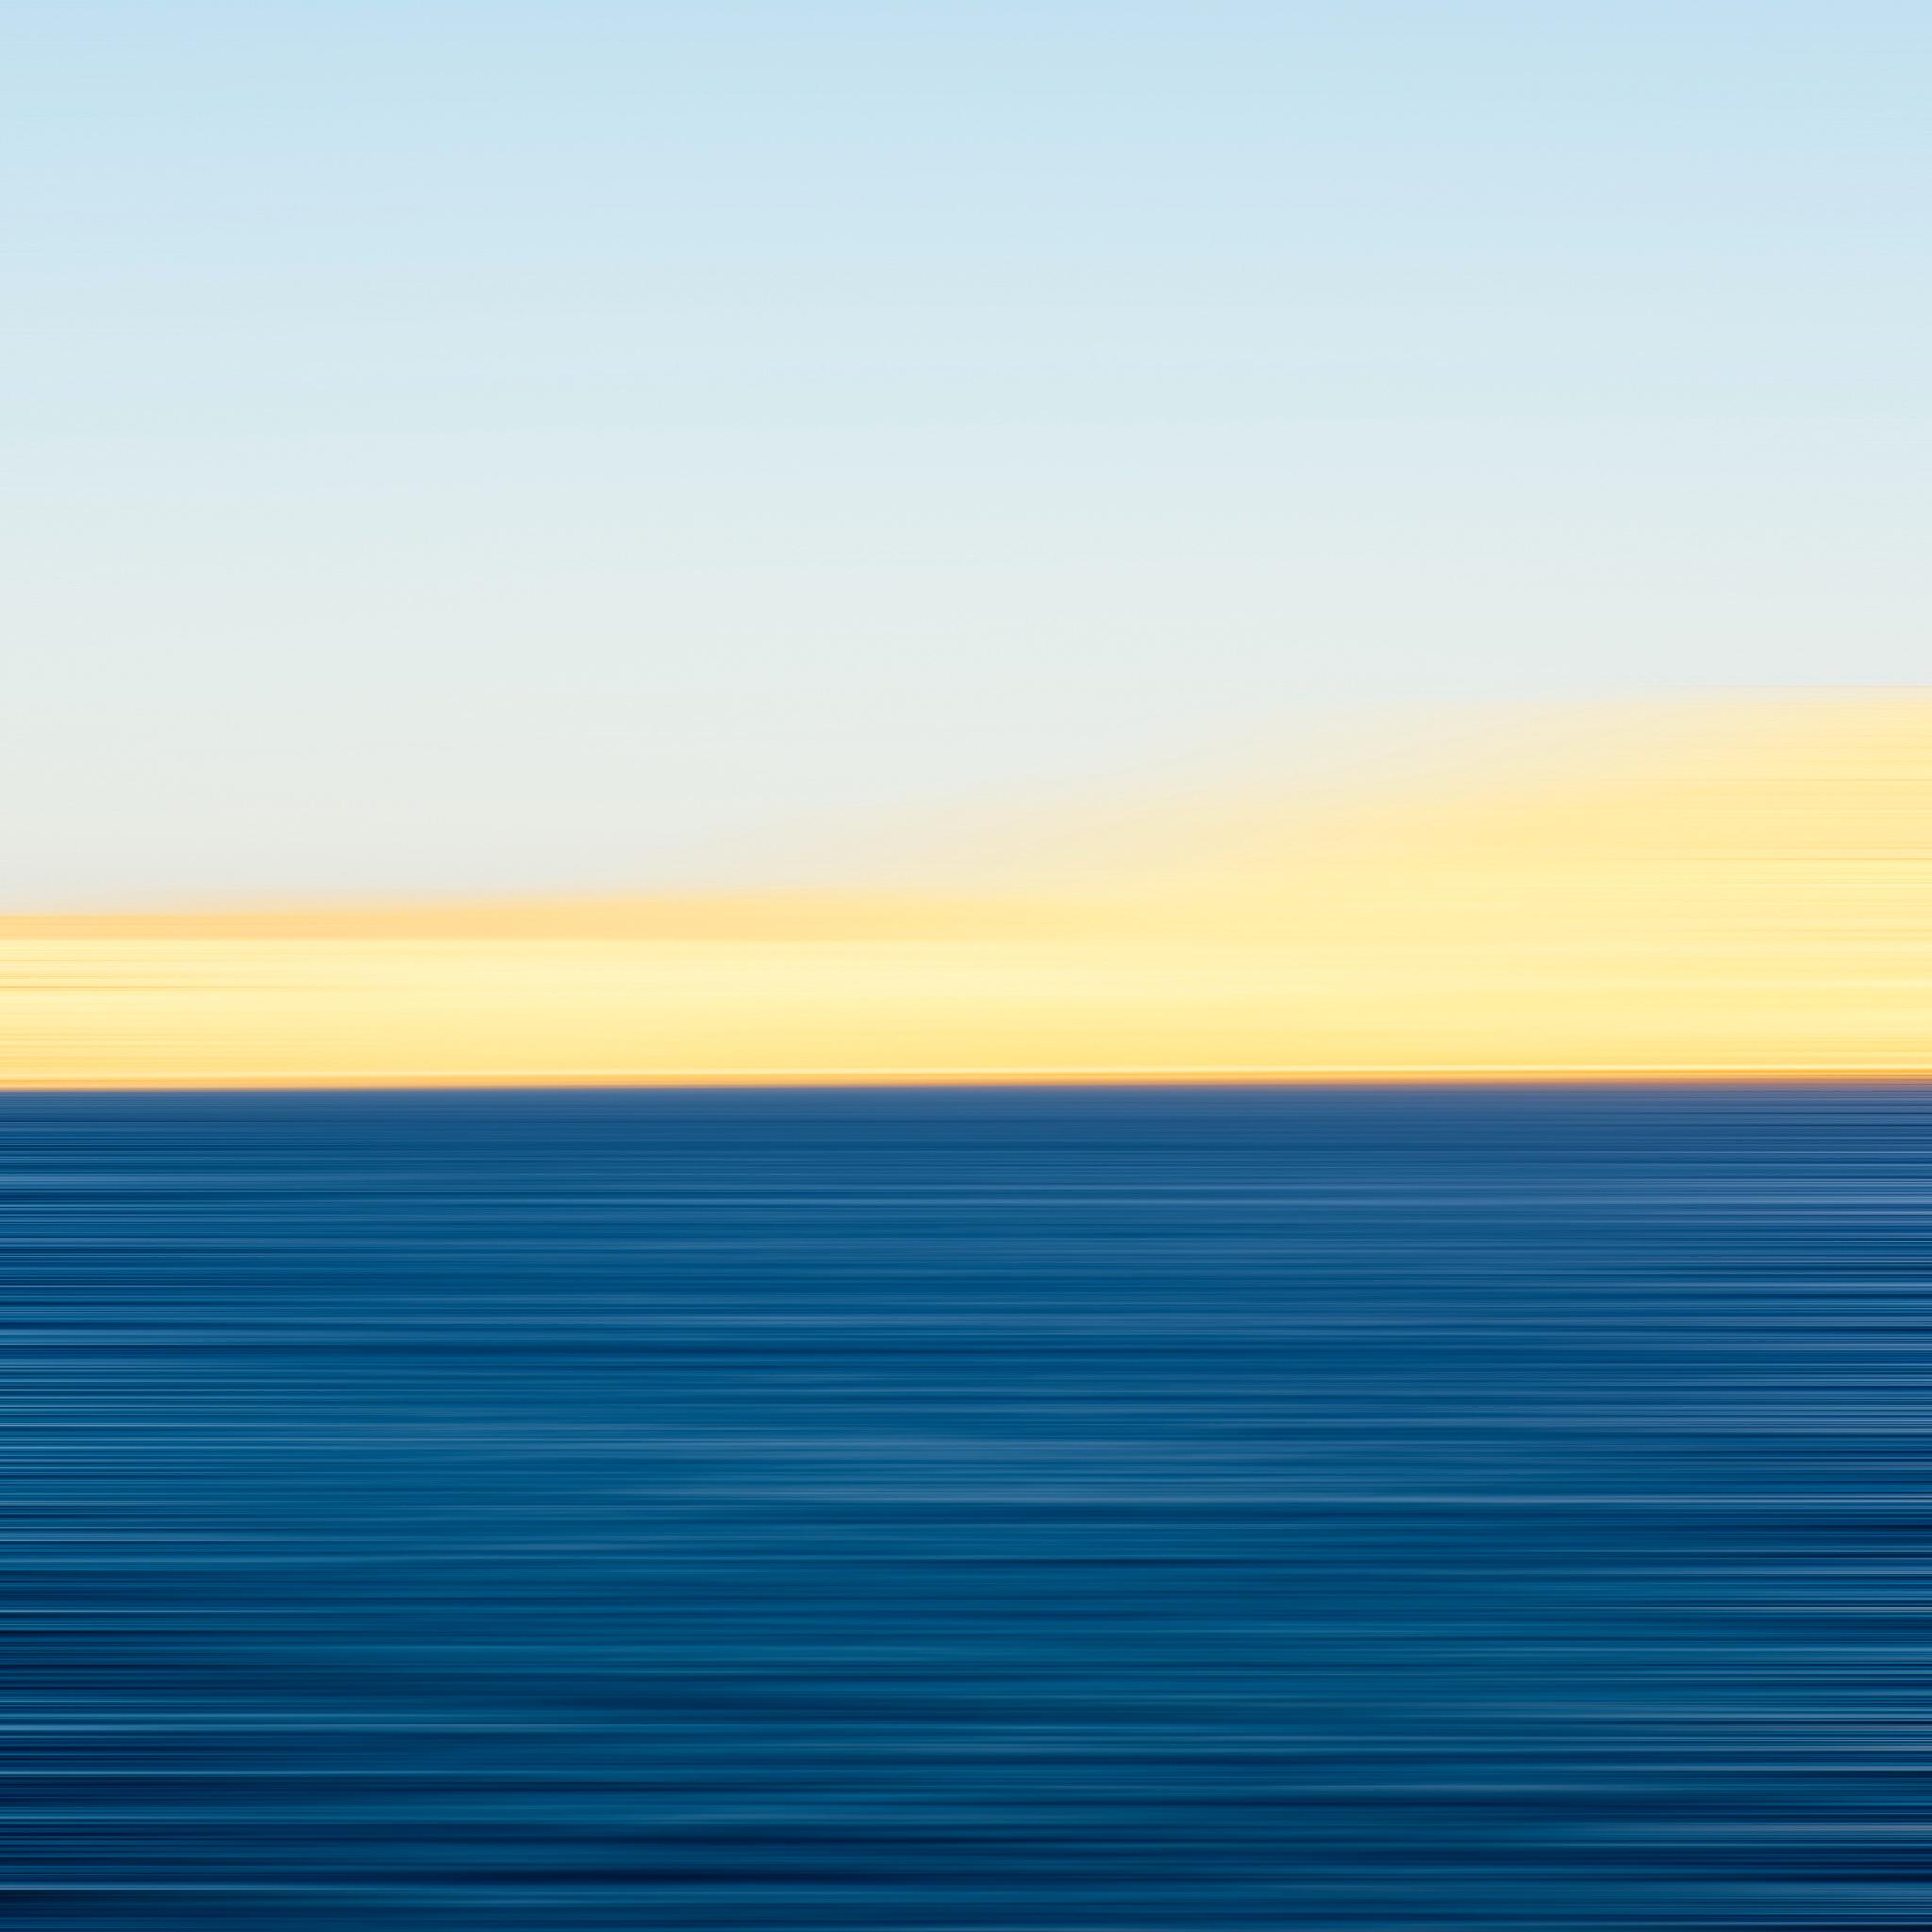 Horizon-3Wallpapers-ipad-Retina